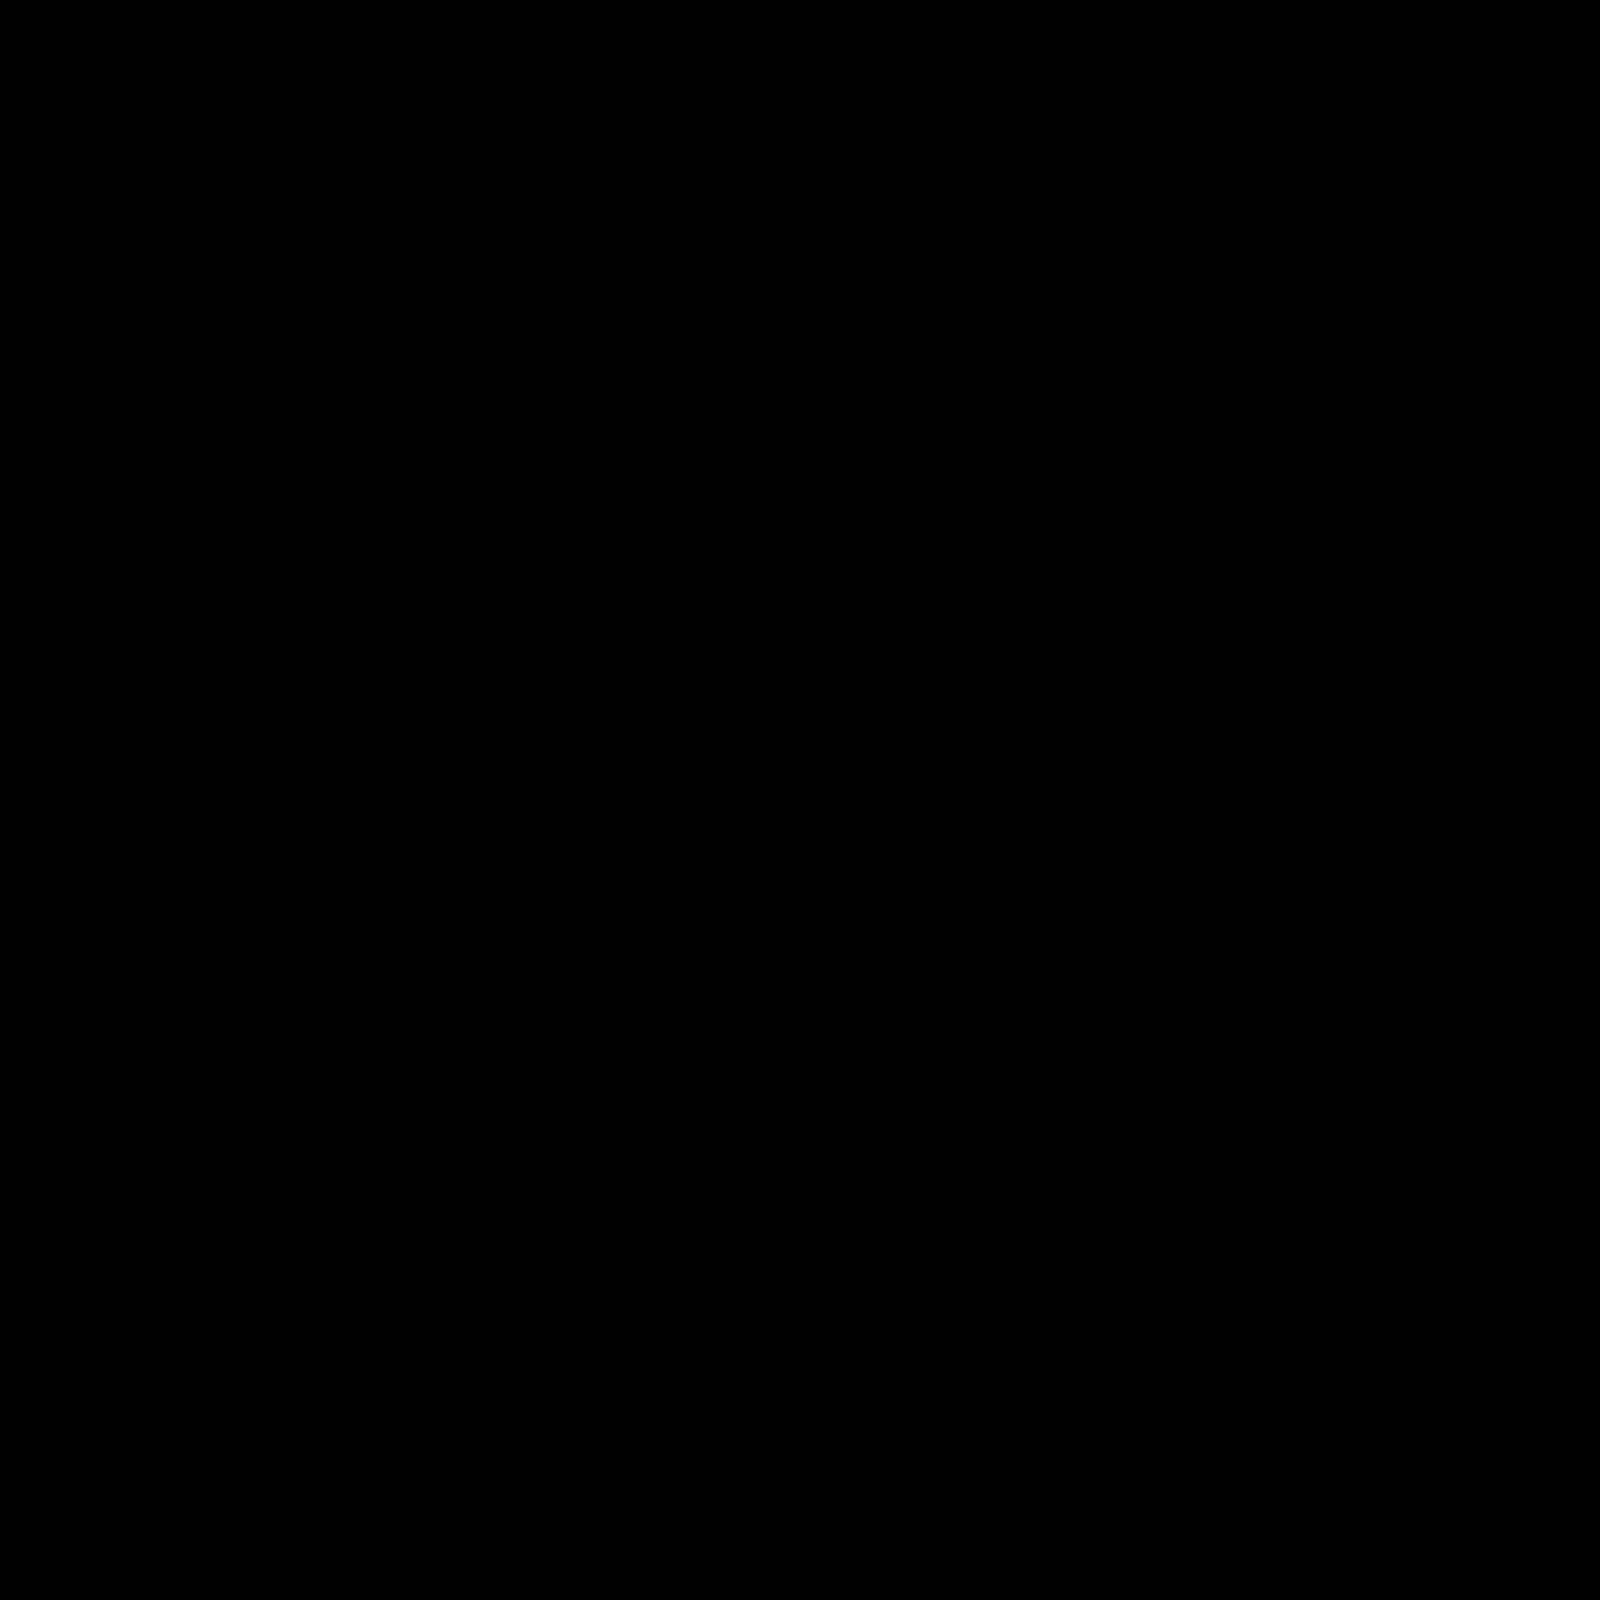 人工种植 icon. It's a photo of an open hand with what looks to be soil or dirt in it, with a leaf and a stem coming out of the soil. There are no corners, the hand looks to come out of nowhere.